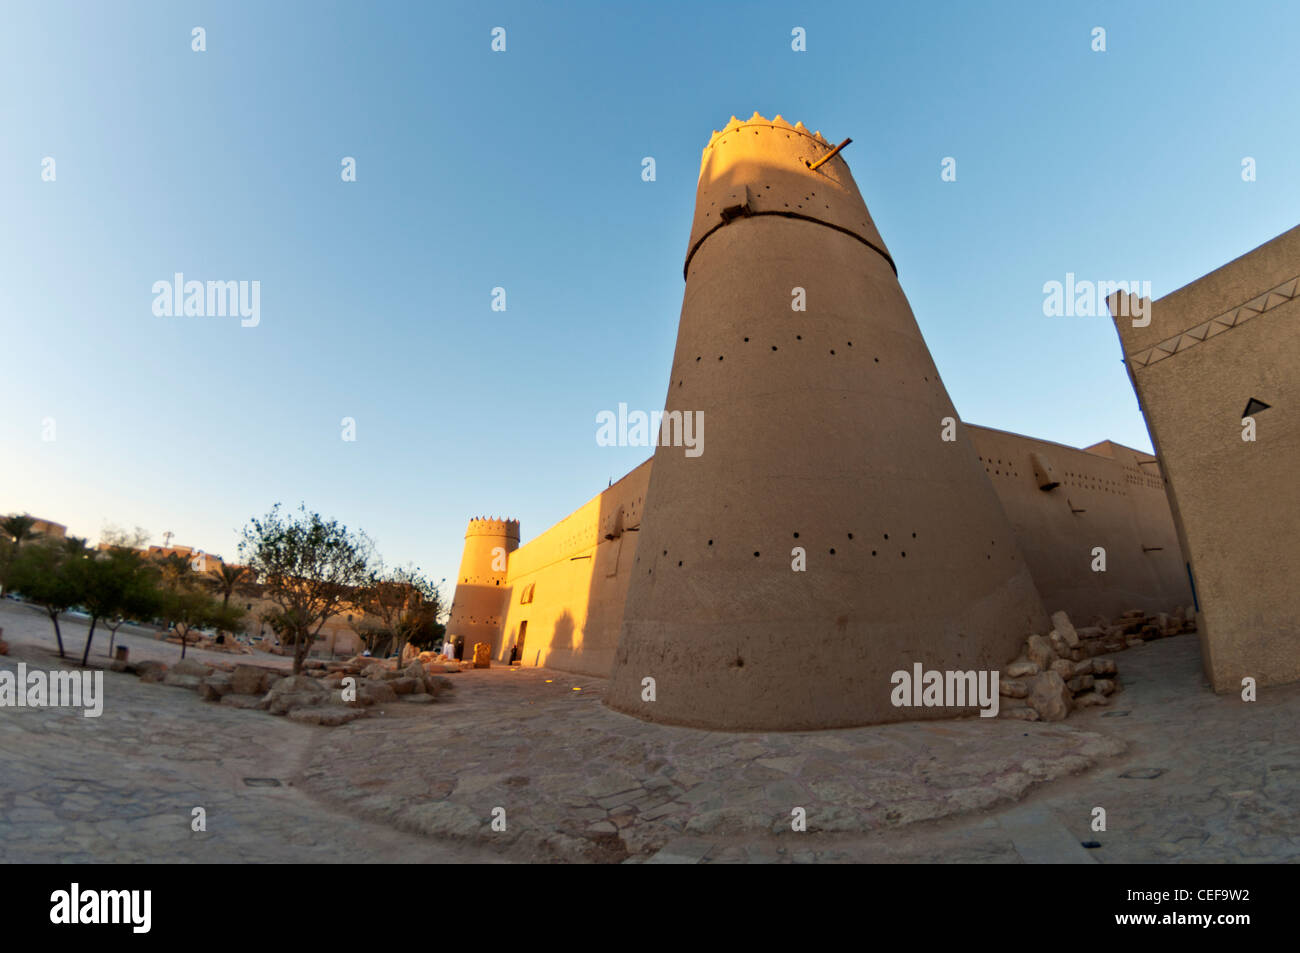 Fort pareti di Al-Masmak fort a Riyadh in Arabia Saudita Immagini Stock